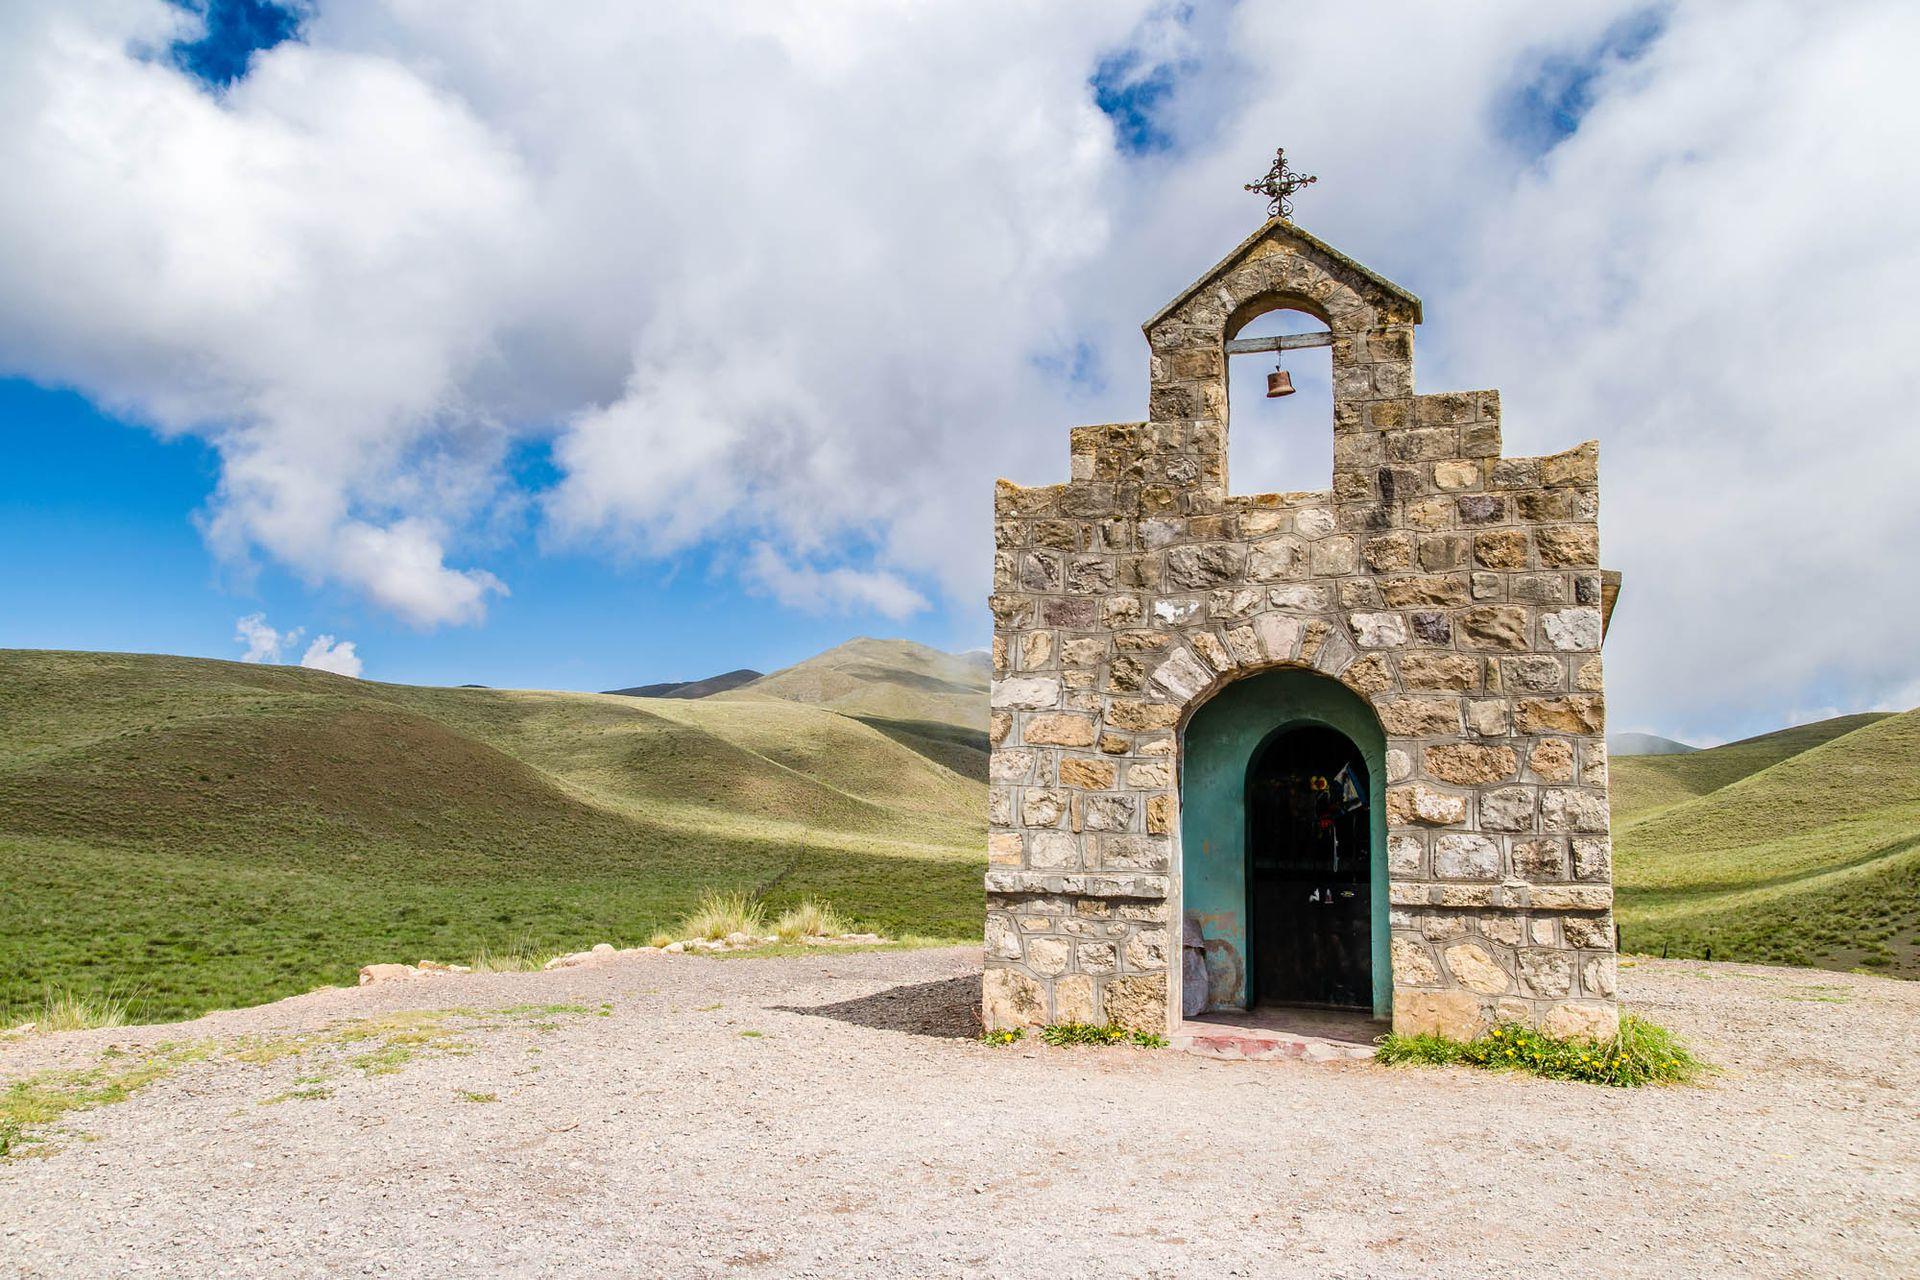 La capilla de San Rafael en la Cuesta del Ovispo